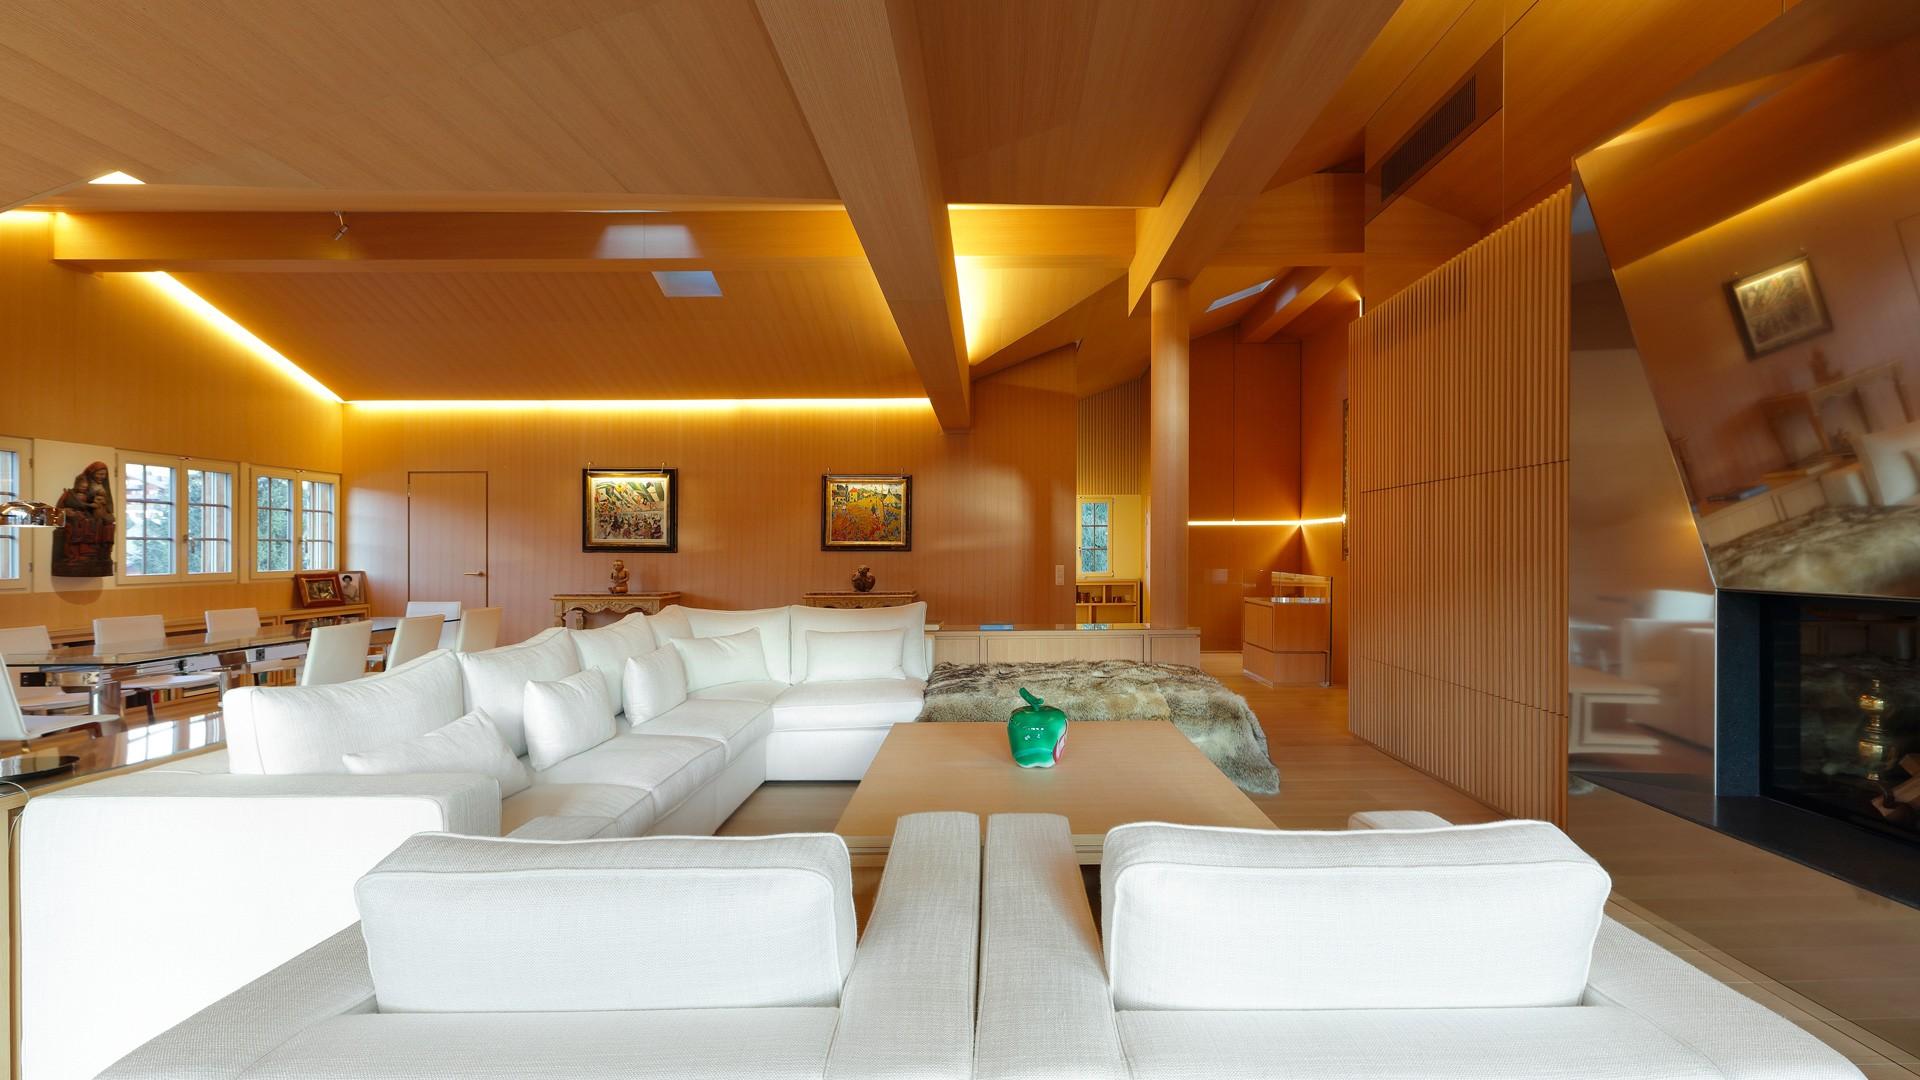 Poliform_contract_residential_ALPINA_APARTAMENTS_04_1920x1080px_gallery